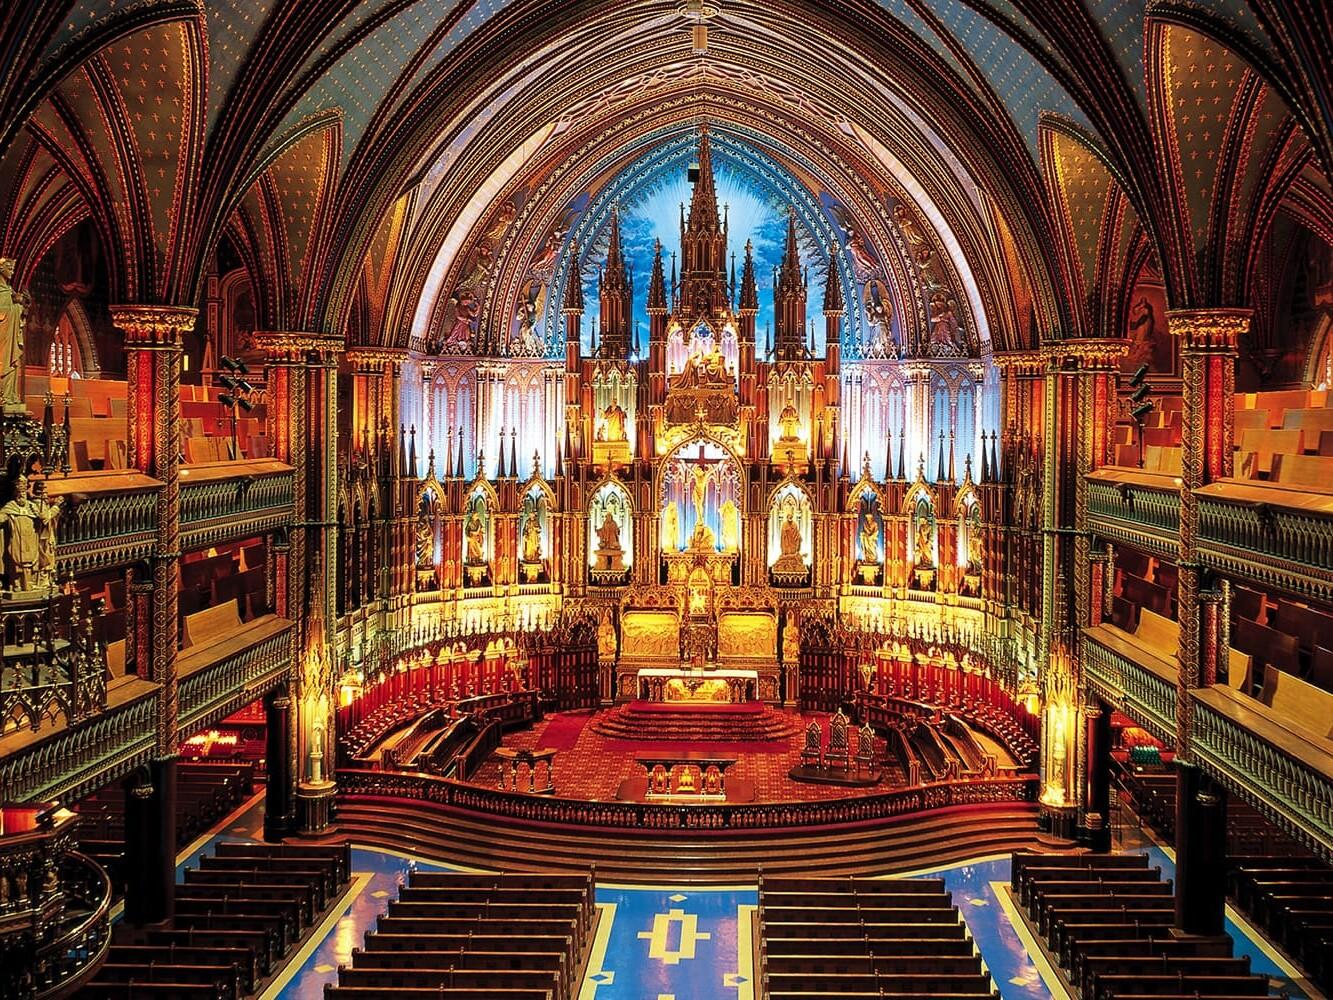 notre-dame-basilica-montreal-interior-main